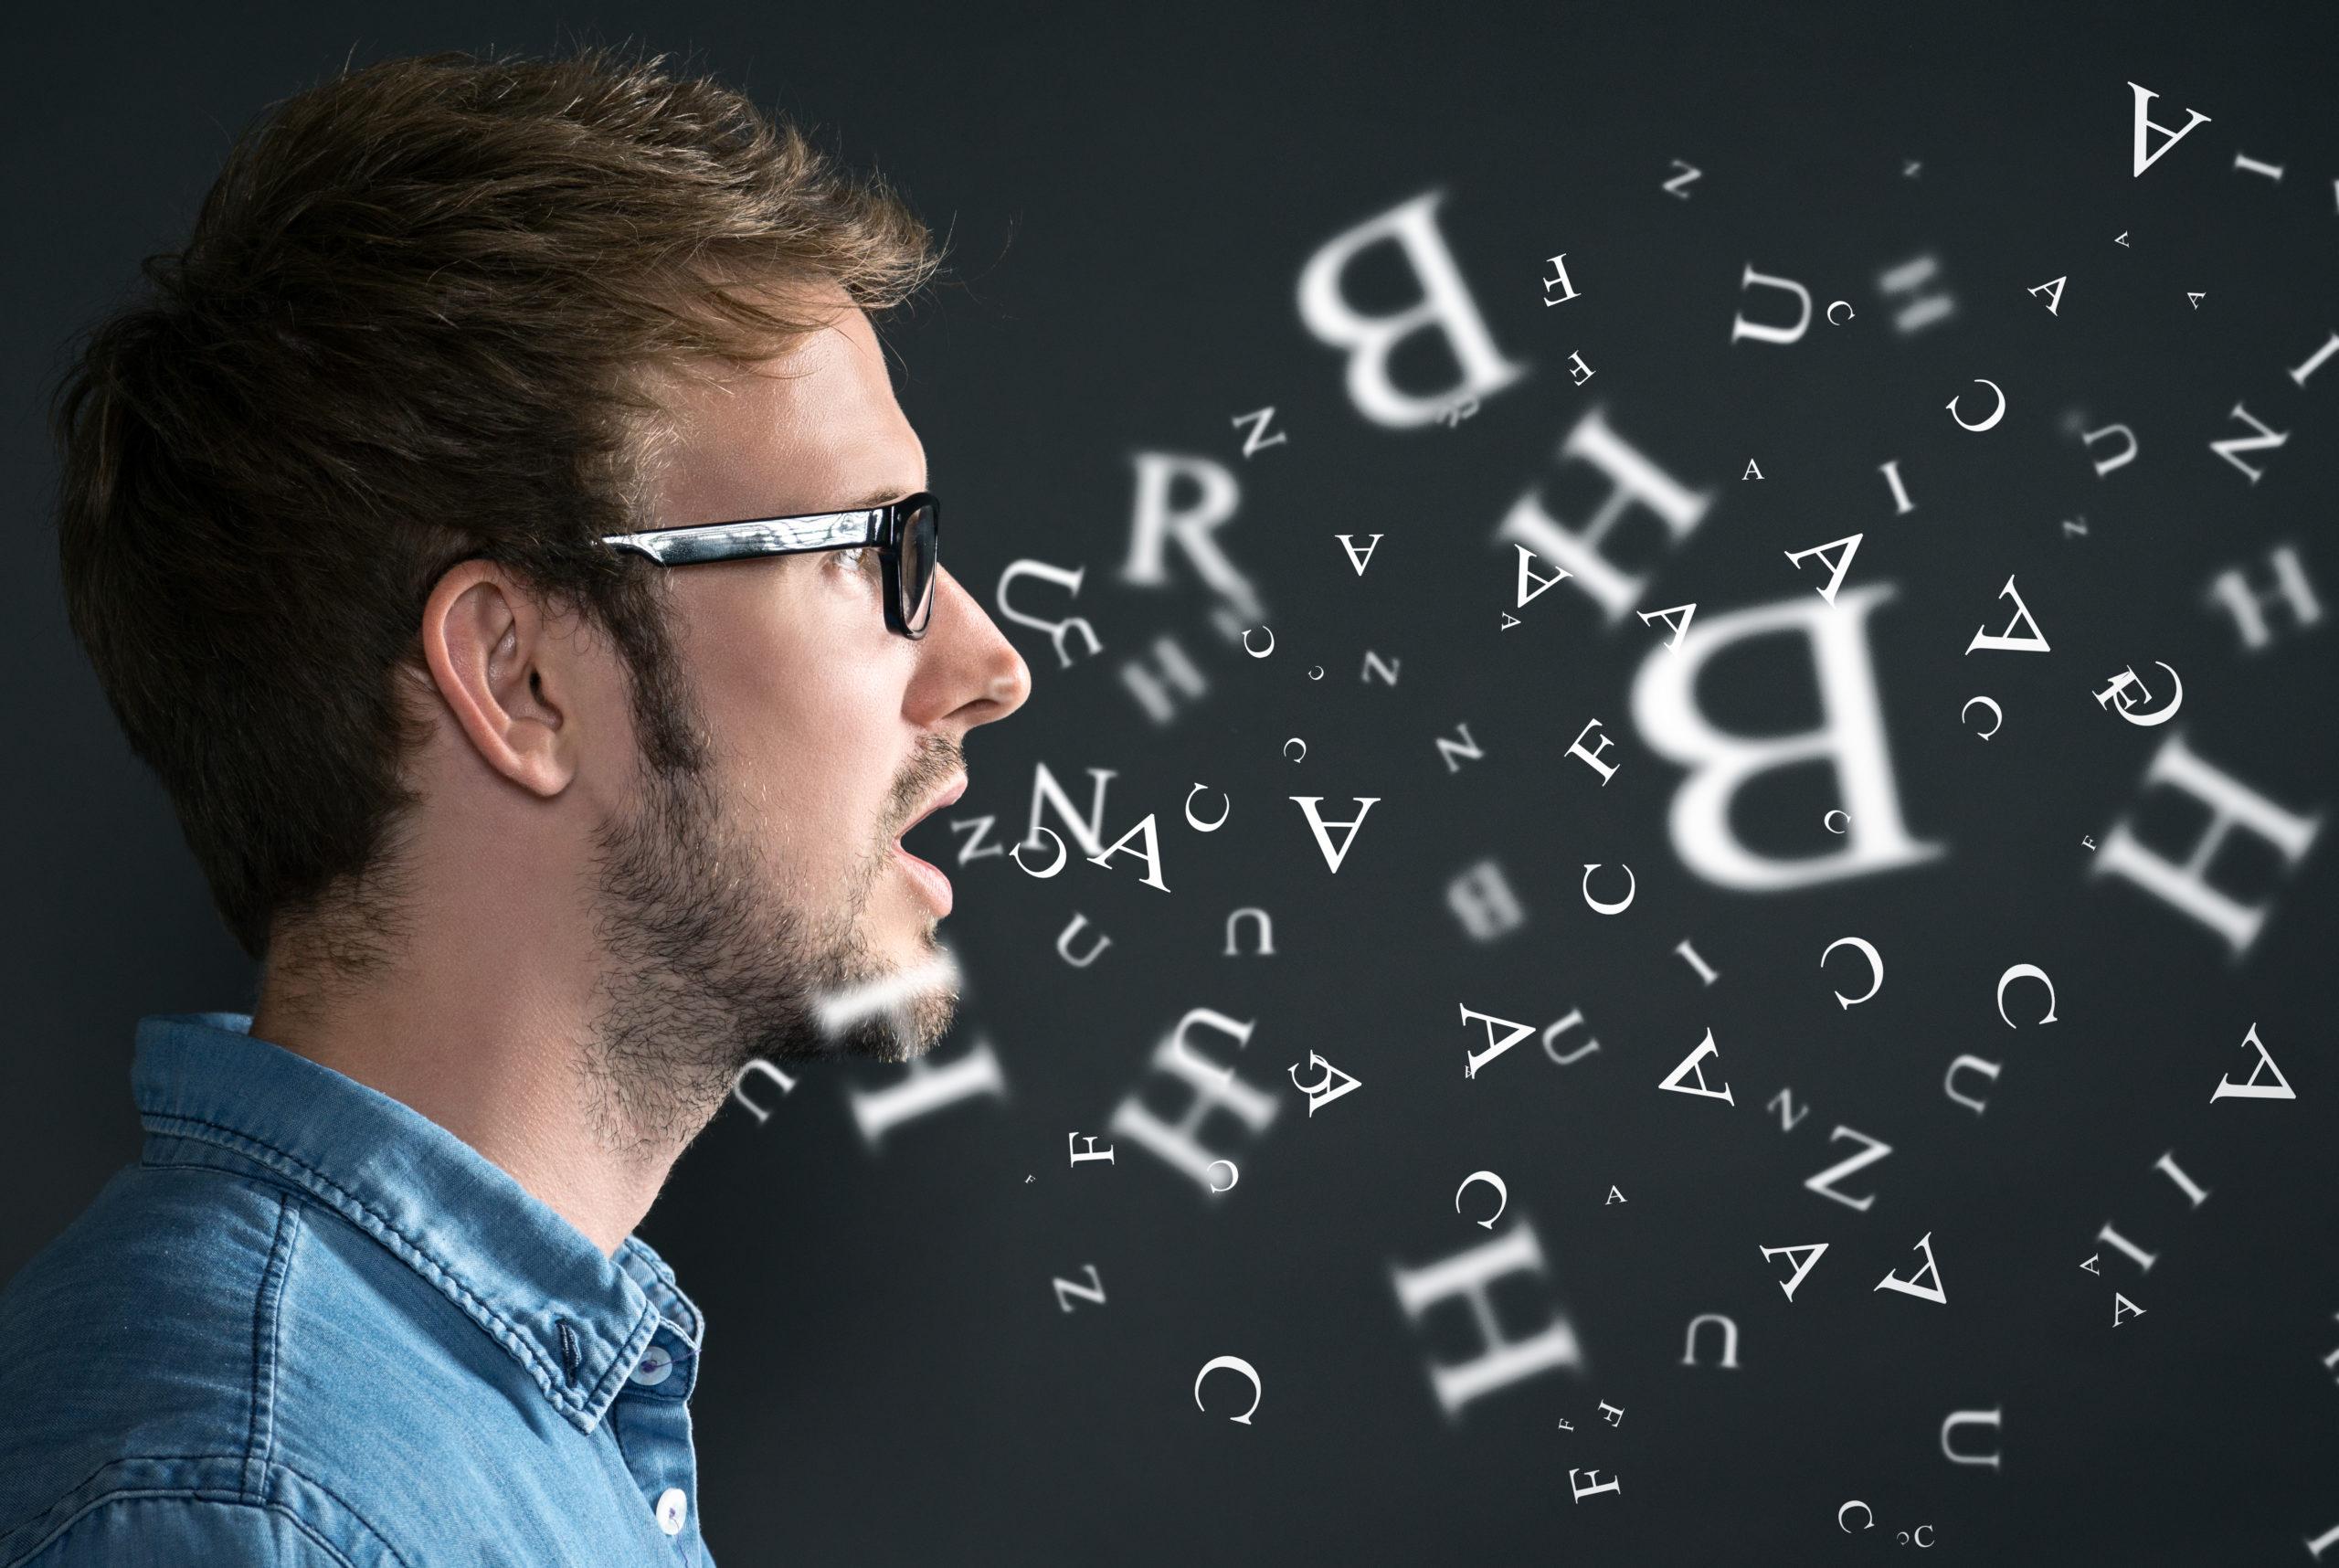 improve speech with dental implants